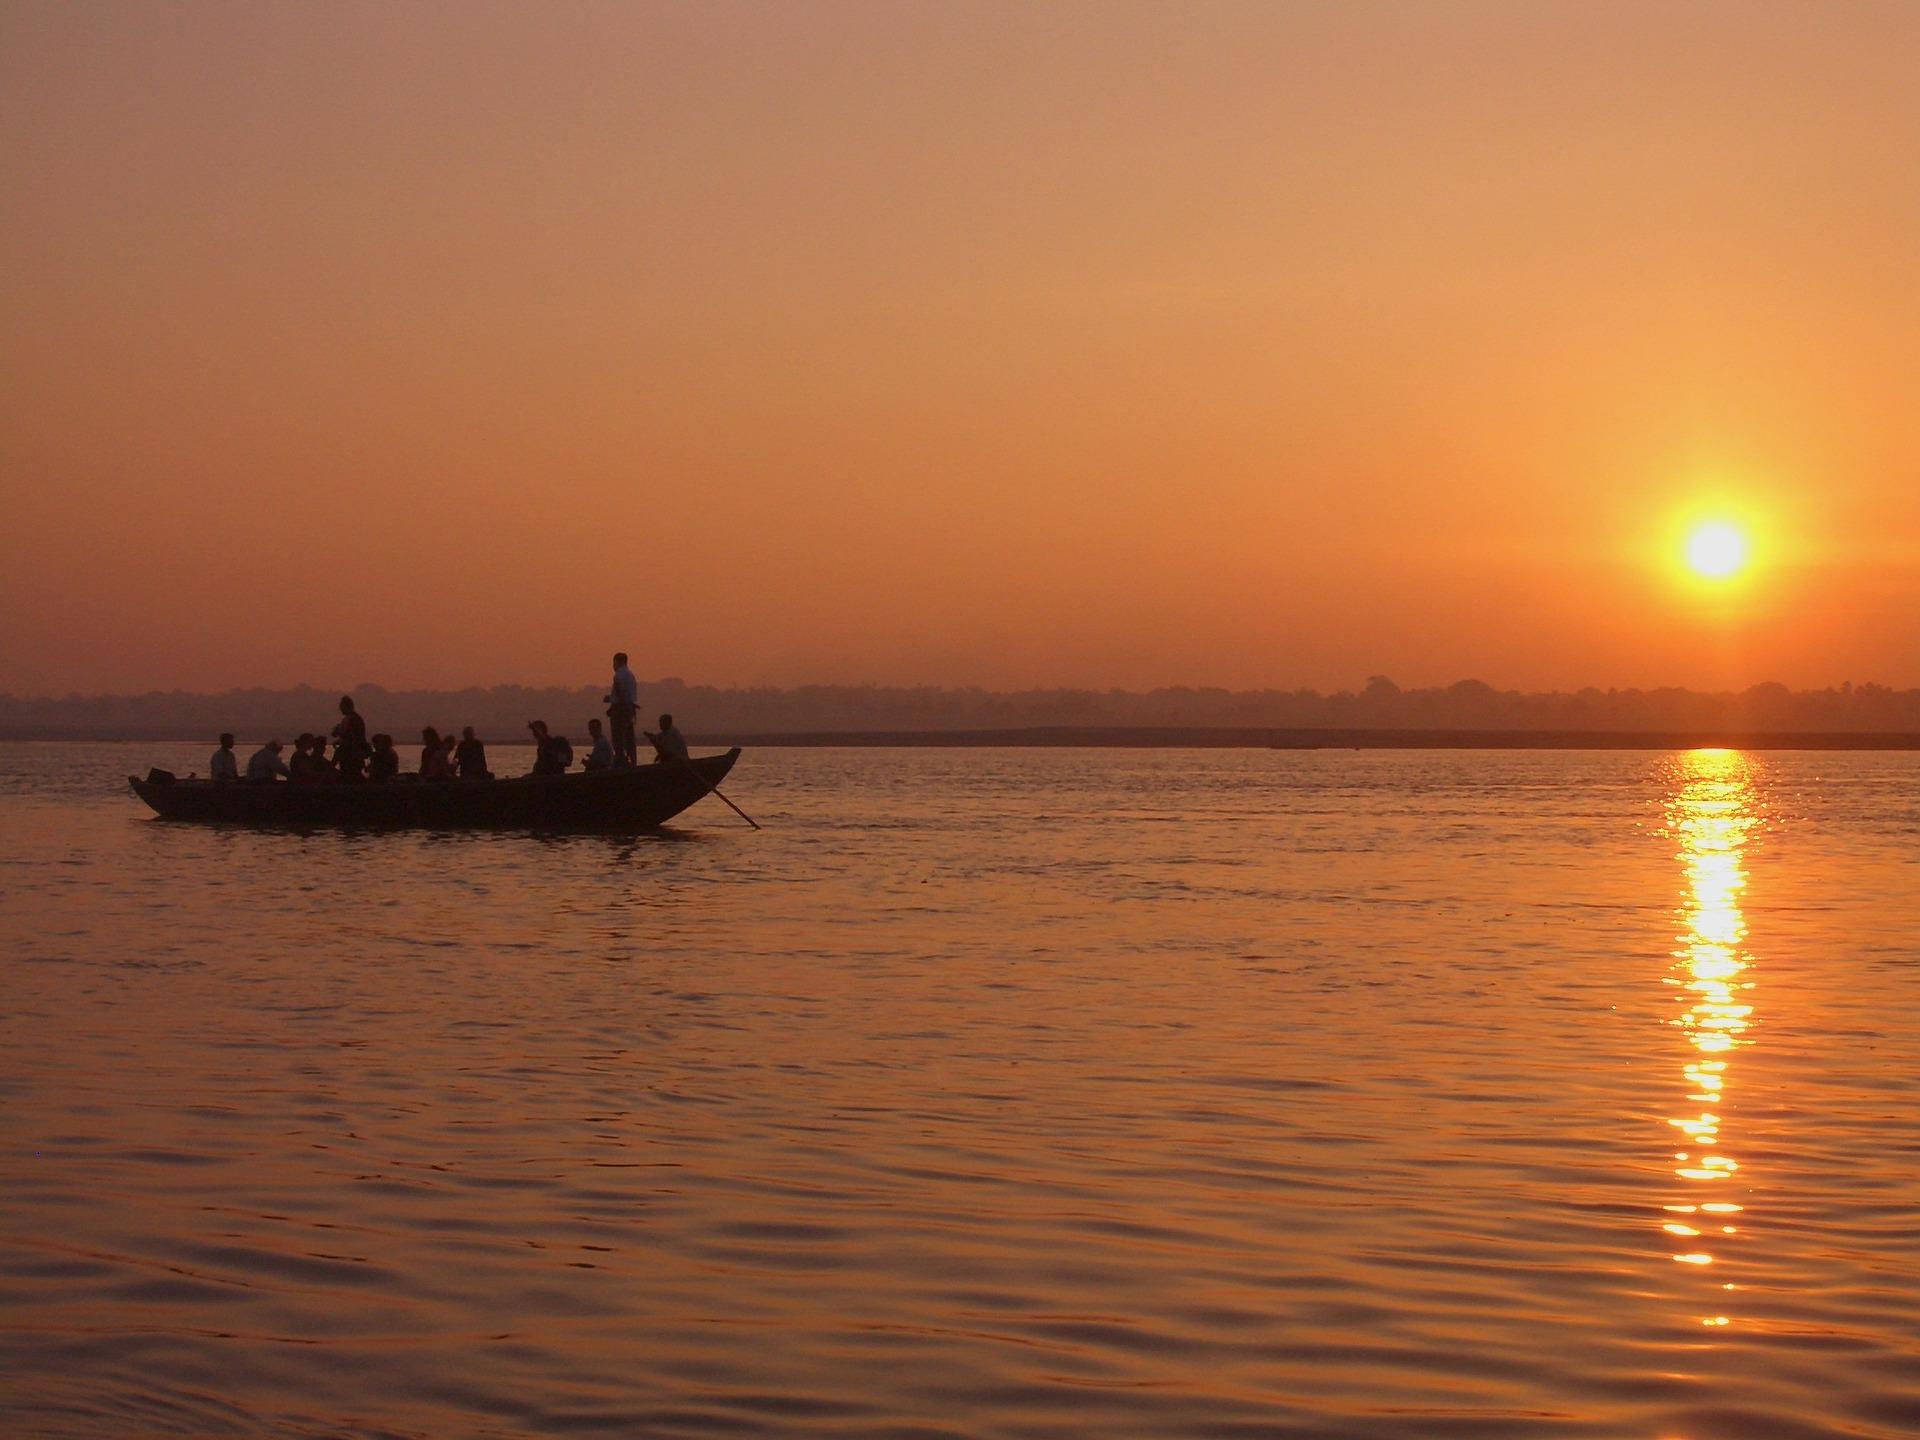 Adventour - India - Gange - Varanasi - sunset